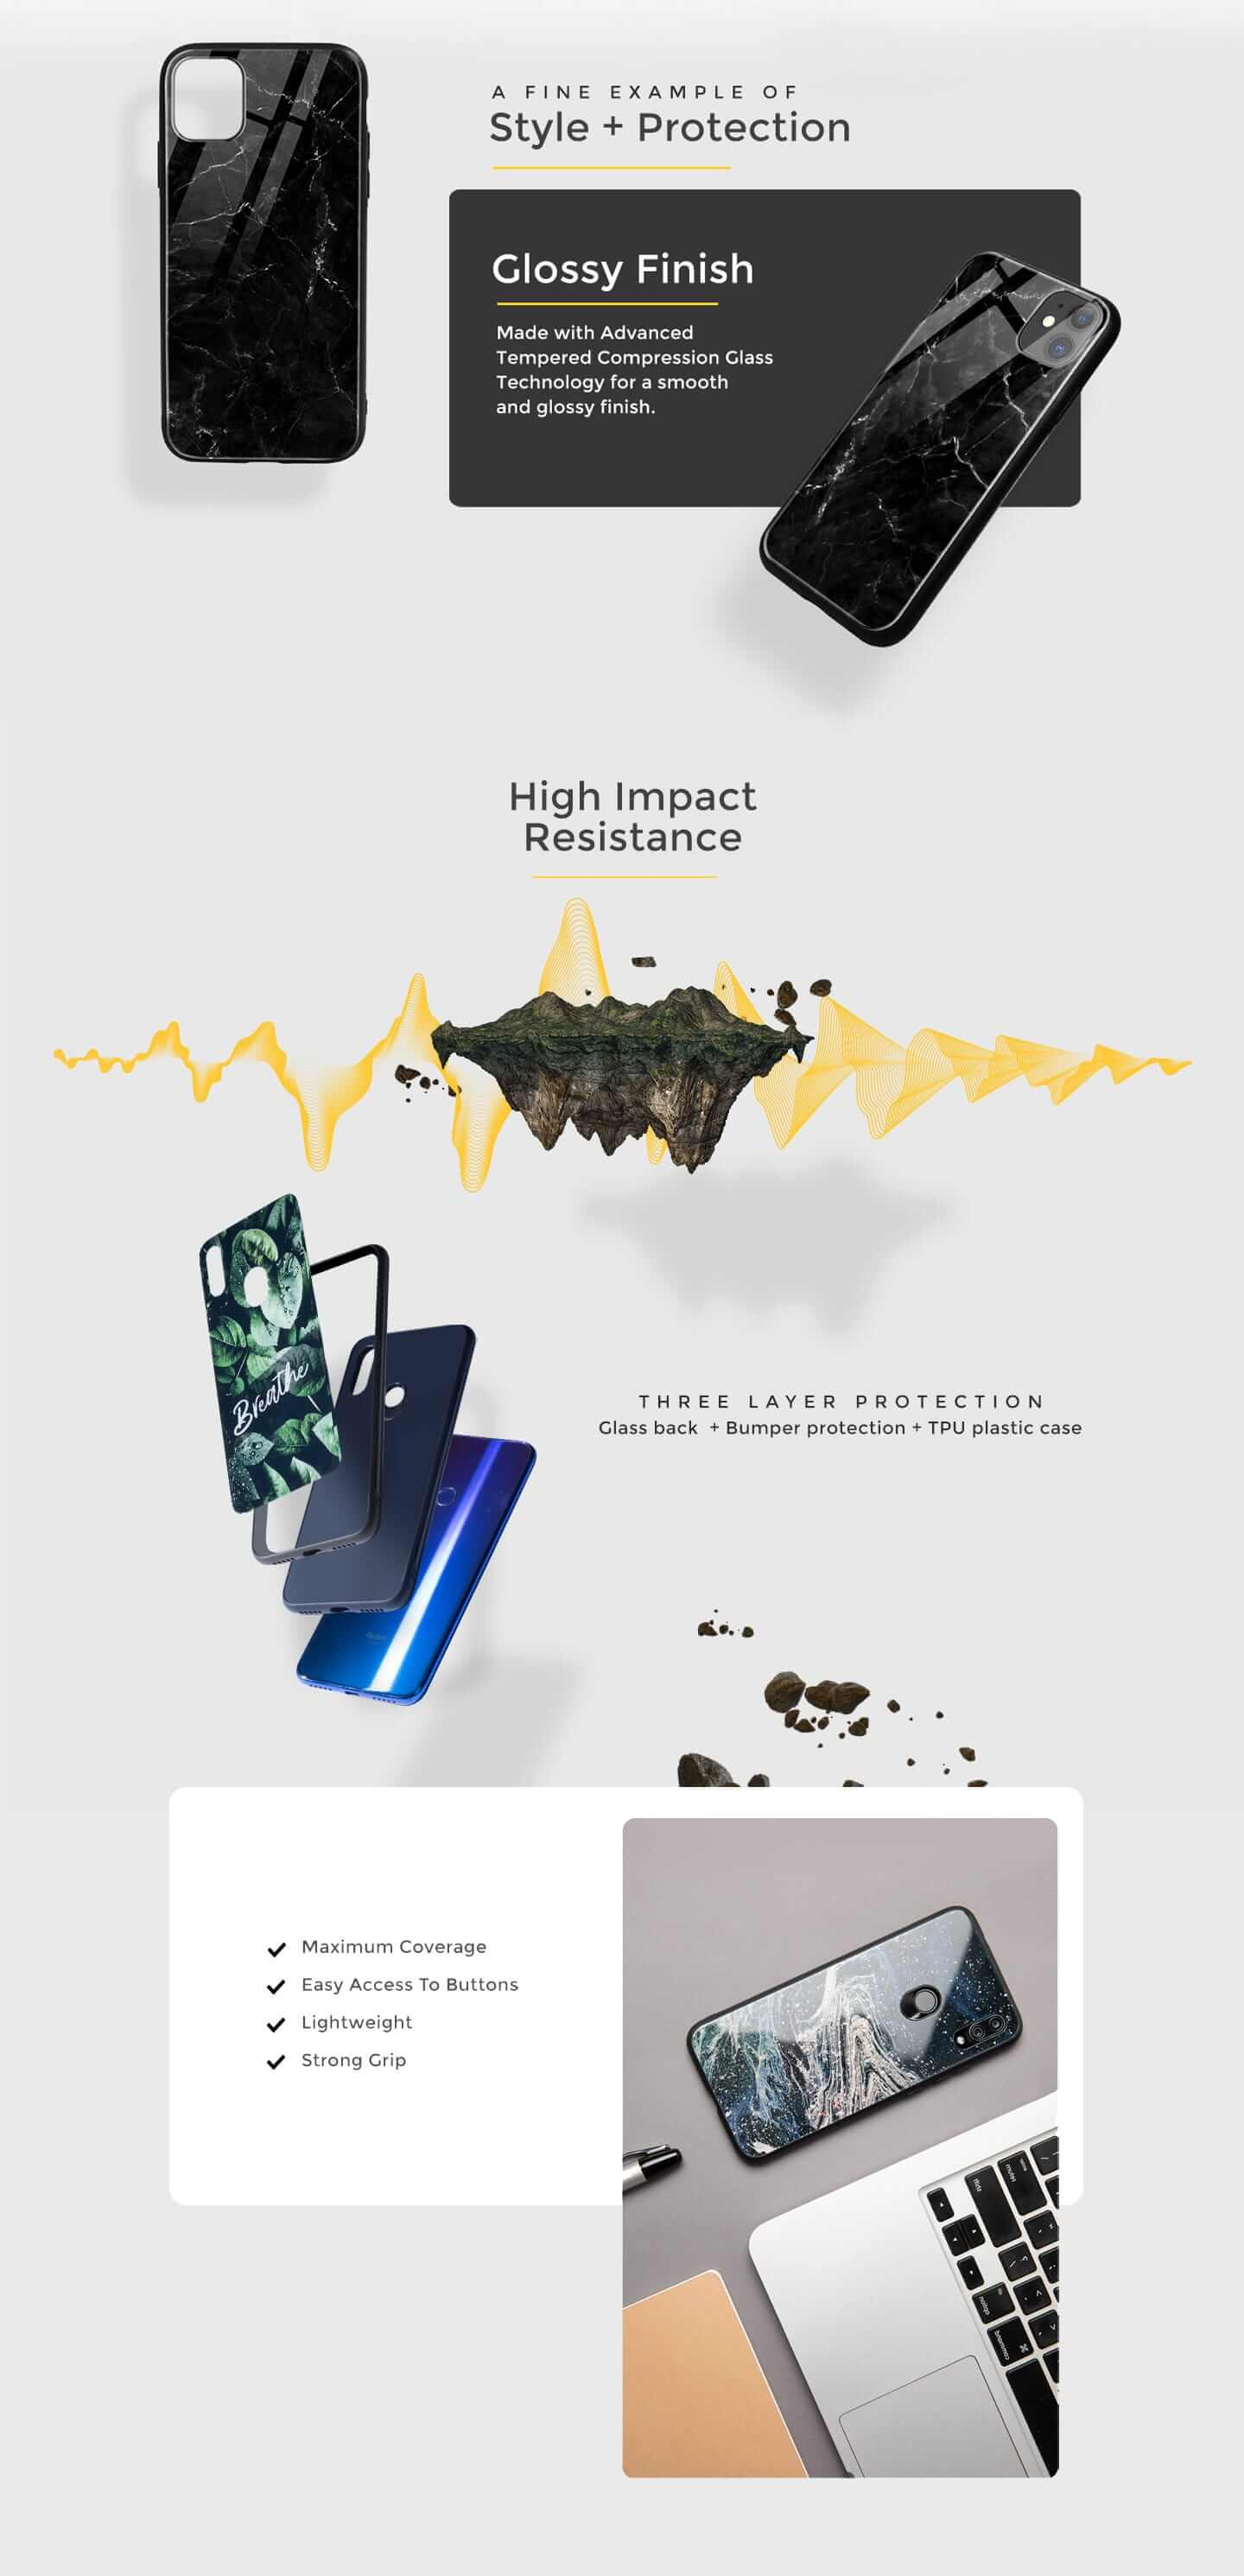 Thor Hammer Vivo V15 Pro Glass Mobile Cover (AVL) Description Image Website 0@Bewakoof.com